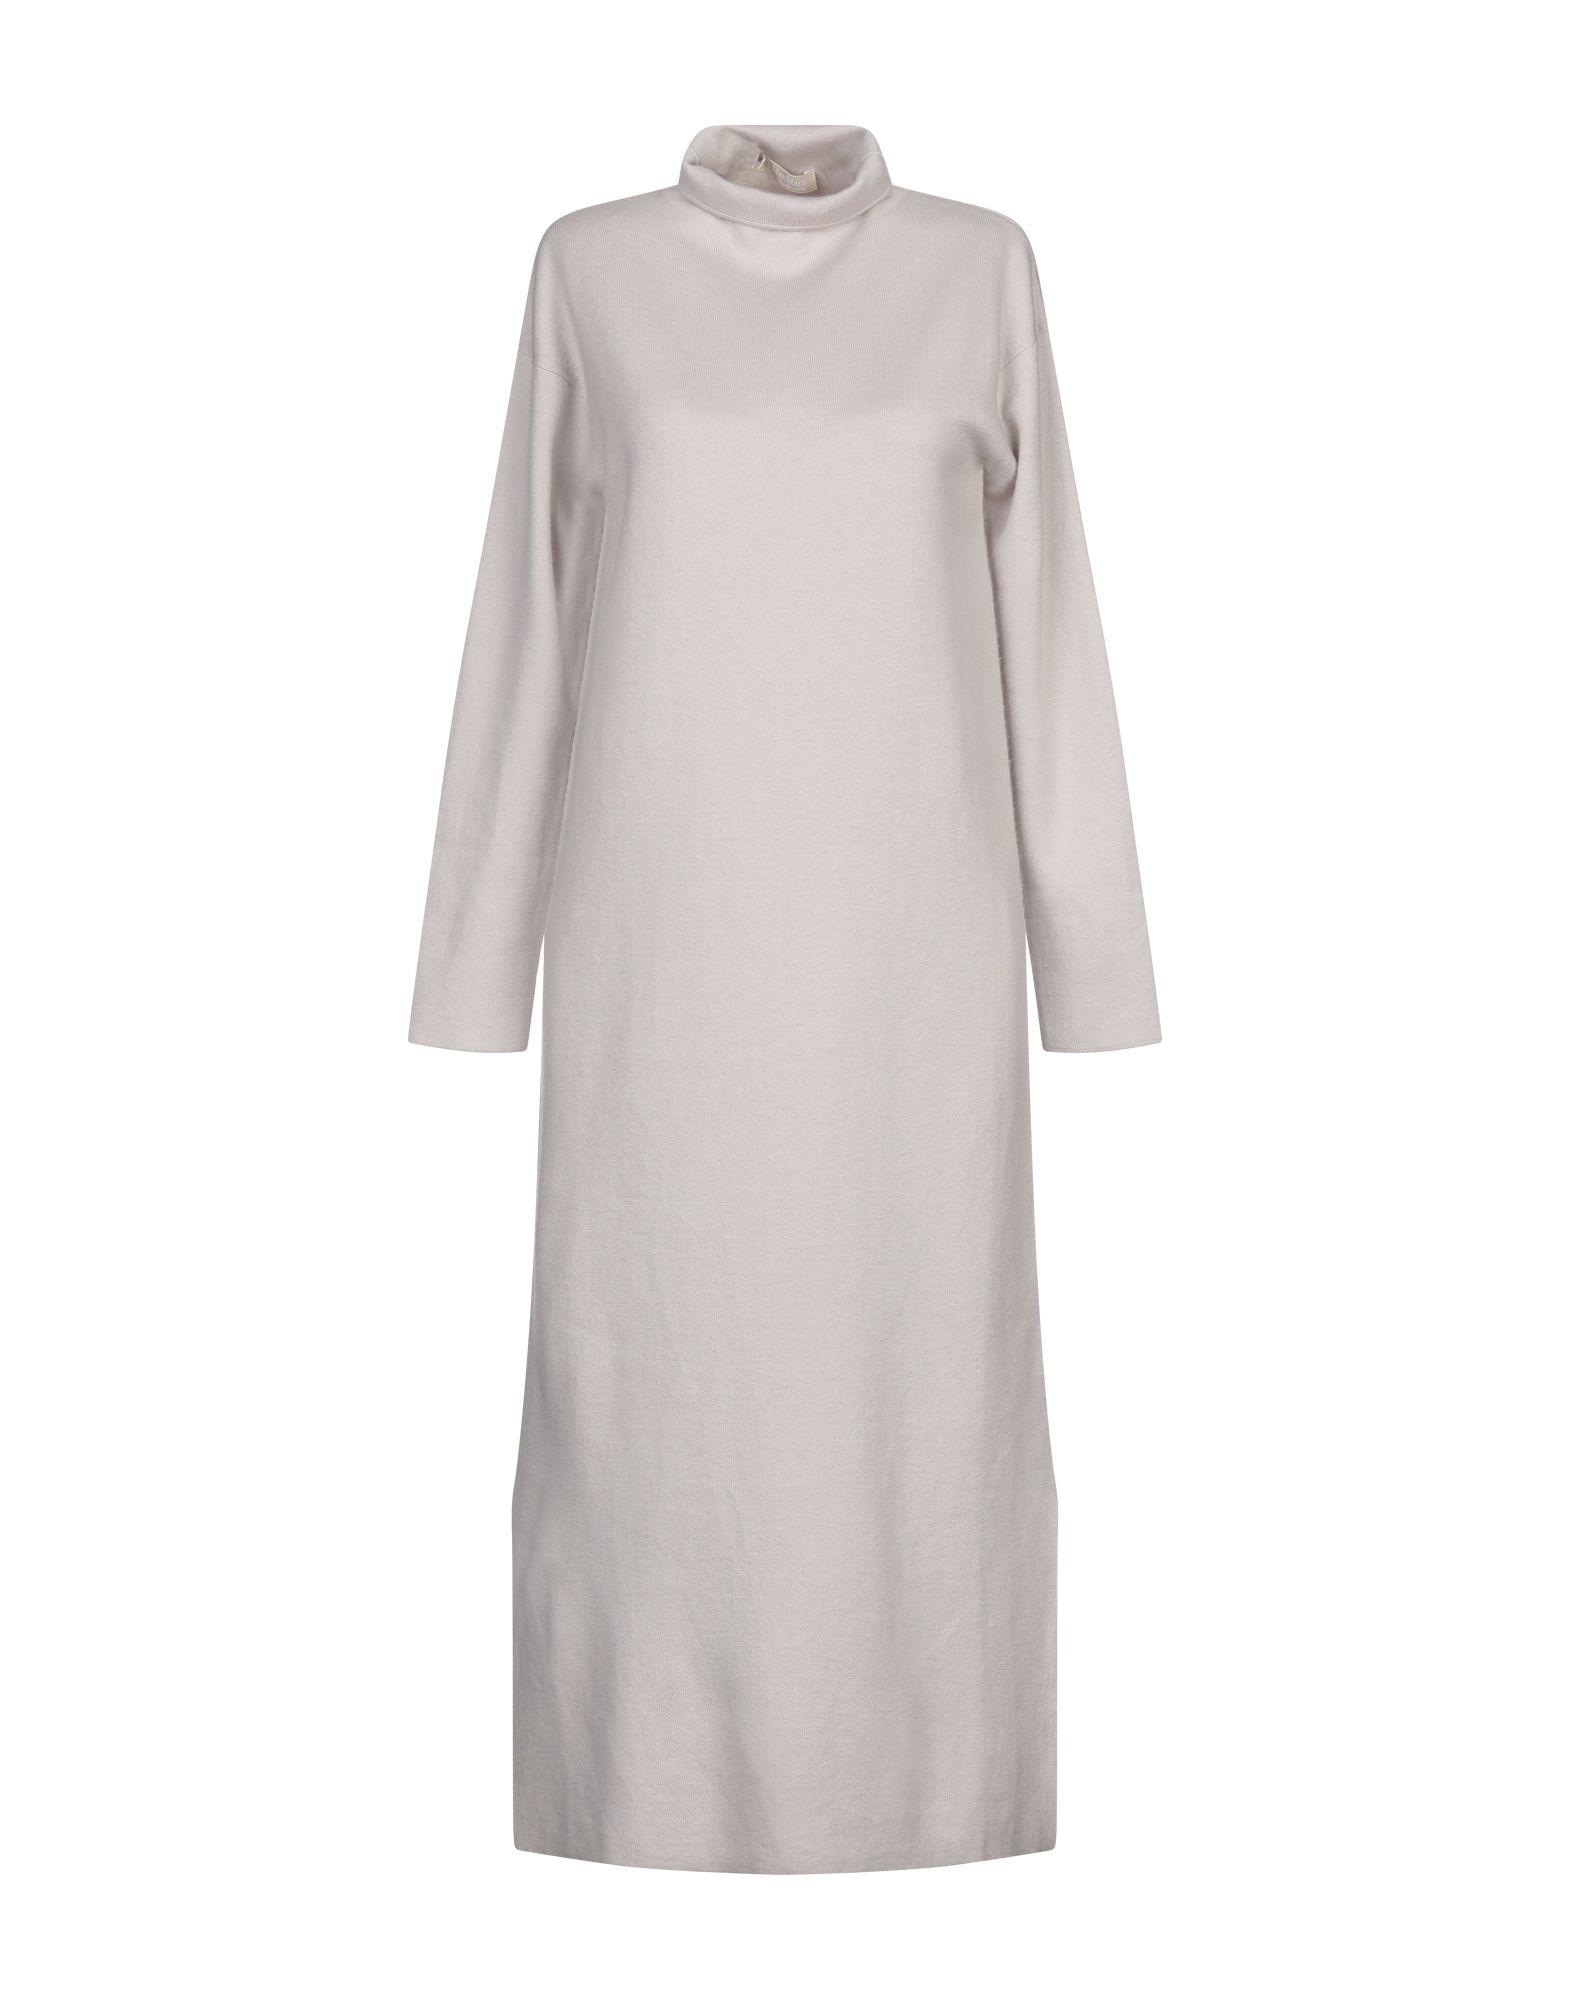 'S MAX MARA Платье длиной 3/4 bulova 96p127